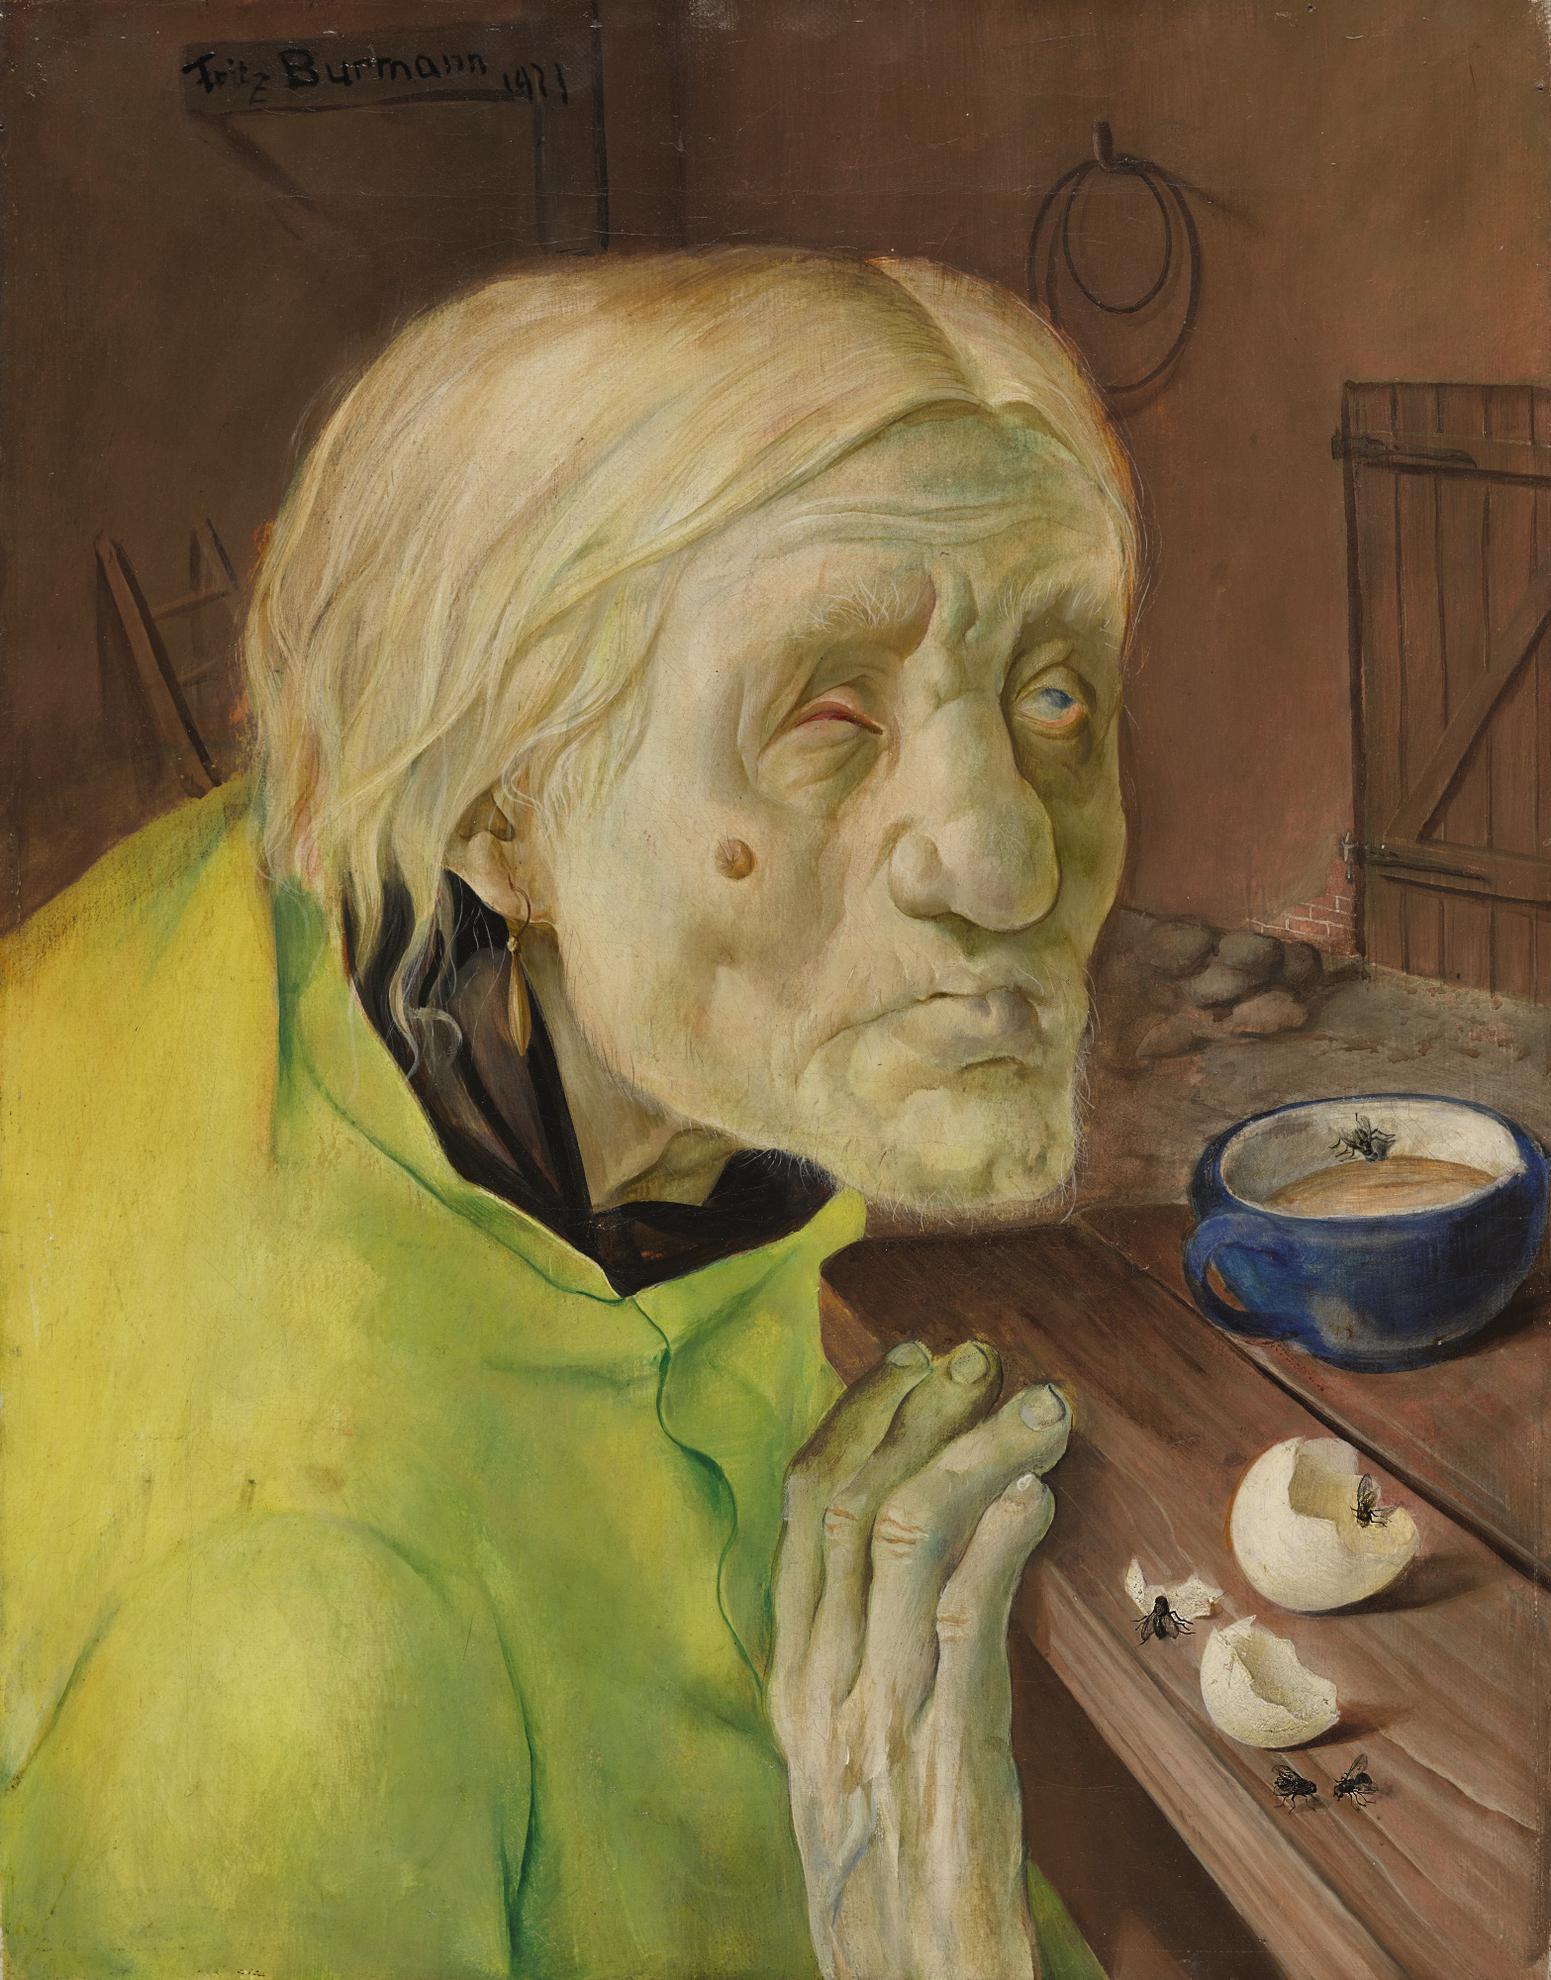 Fritz Burmann - Frau Biene Aus Worpswede, 87 Jahre Alt (Mrs Biene From Worpswede, 87 Years Old)-1923